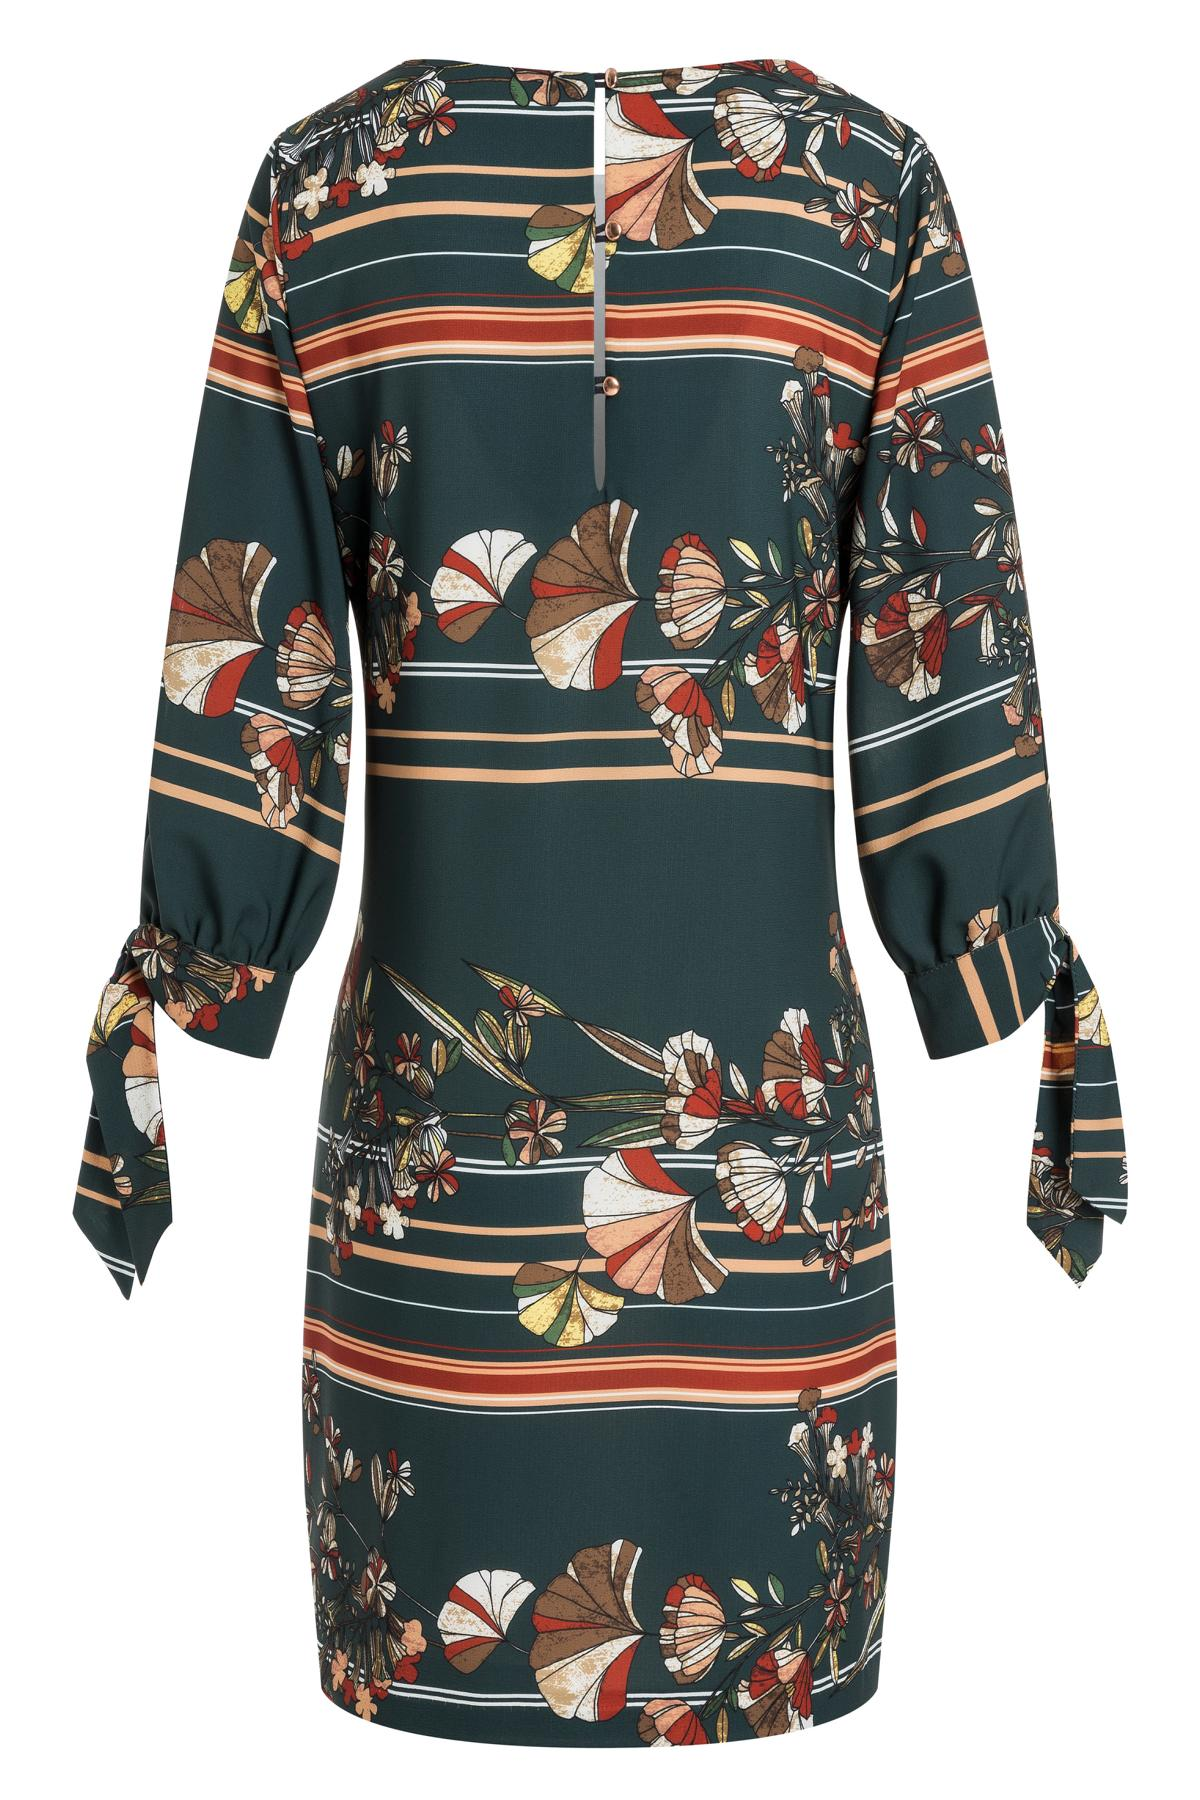 PRODUCT_PICTURE_PRE_7Ana Alcazar Langarm Kleid Talore PRODUCT_PICTURE_SUF_7